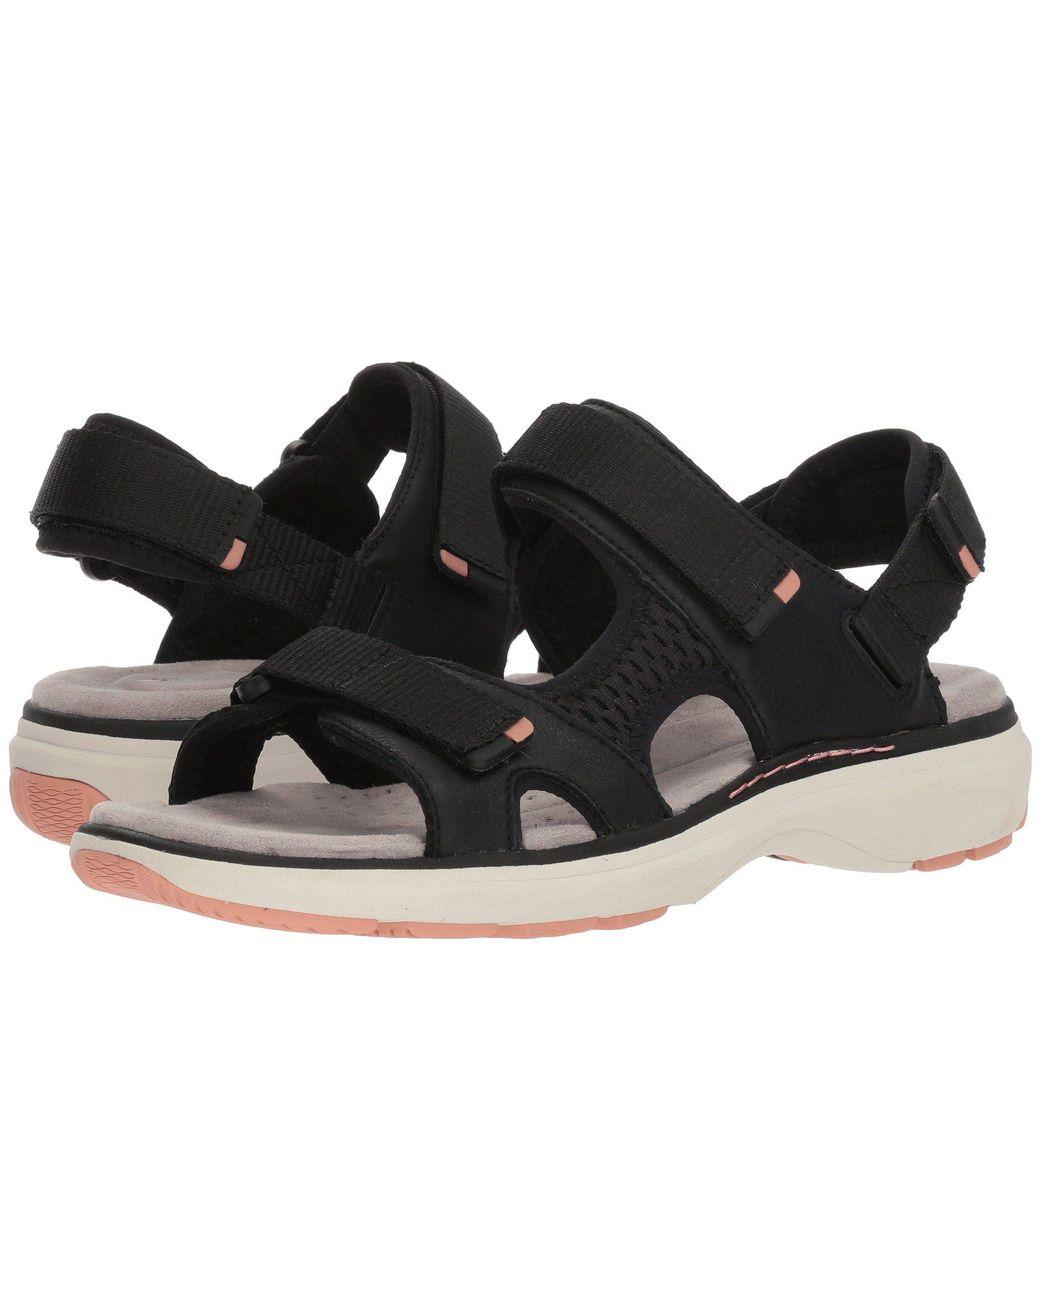 b06968311979 Lyst - Clarks Un Roam Step (black Leather) Women s Sandals in Black